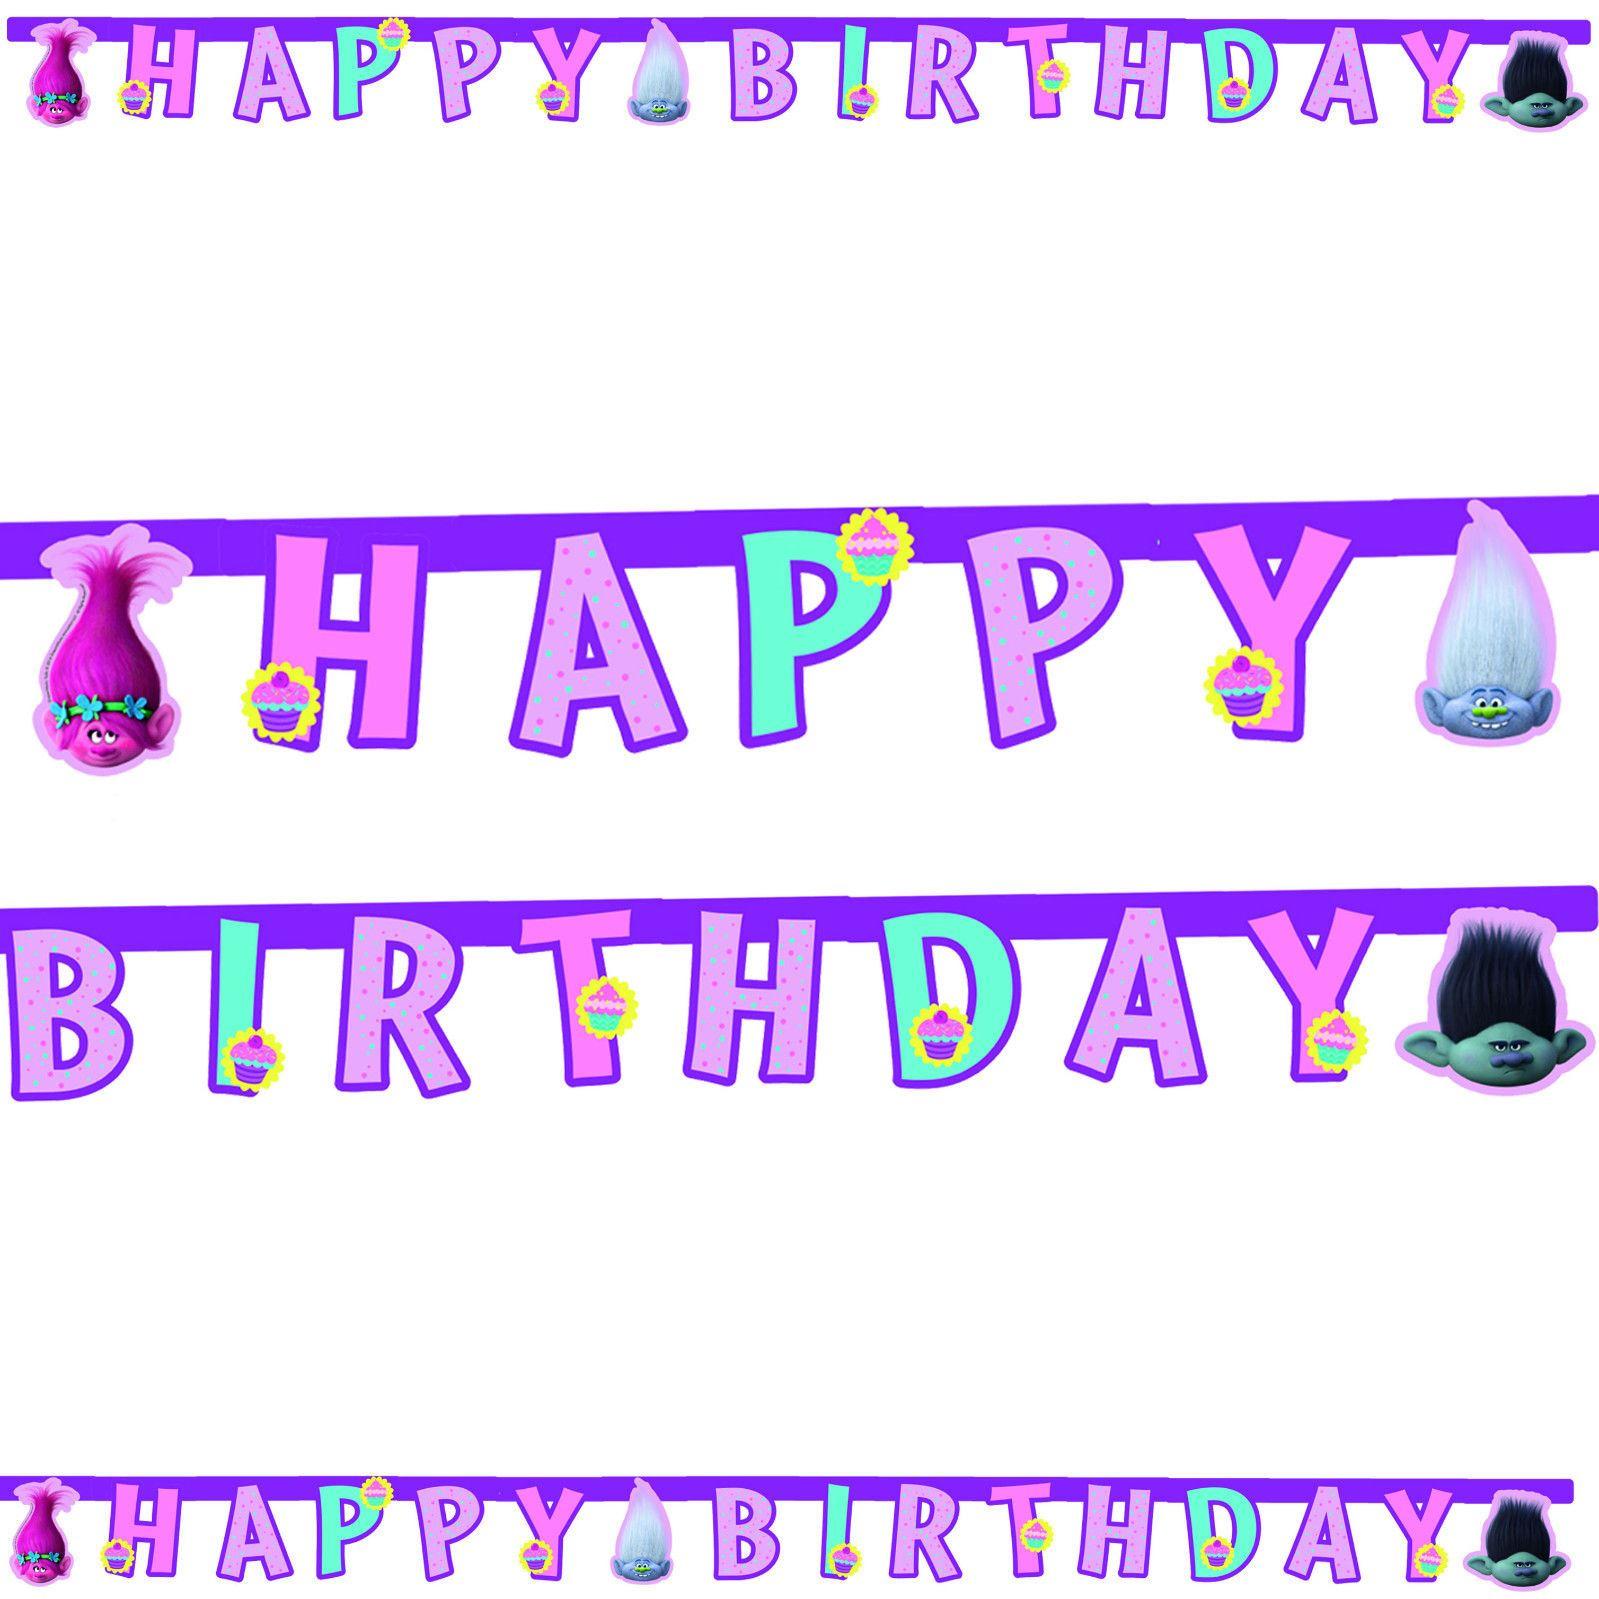 Dreamworks Trolls Birthday Party Decorations Banner